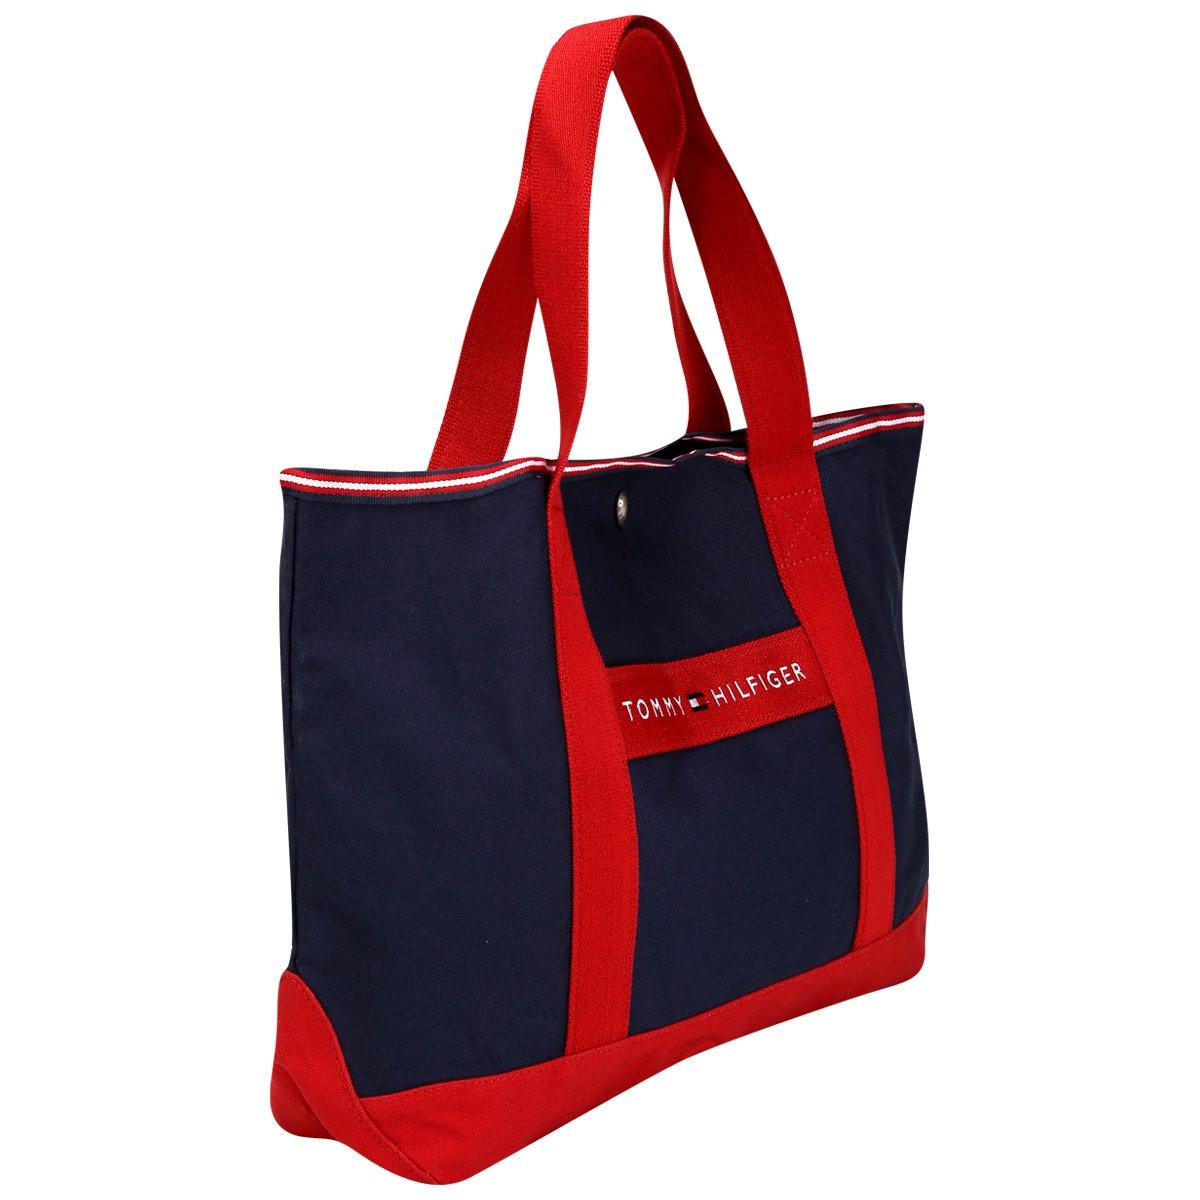 310481438d9 Bolsa Tommy Hilfiger Shopper - Compre Agora